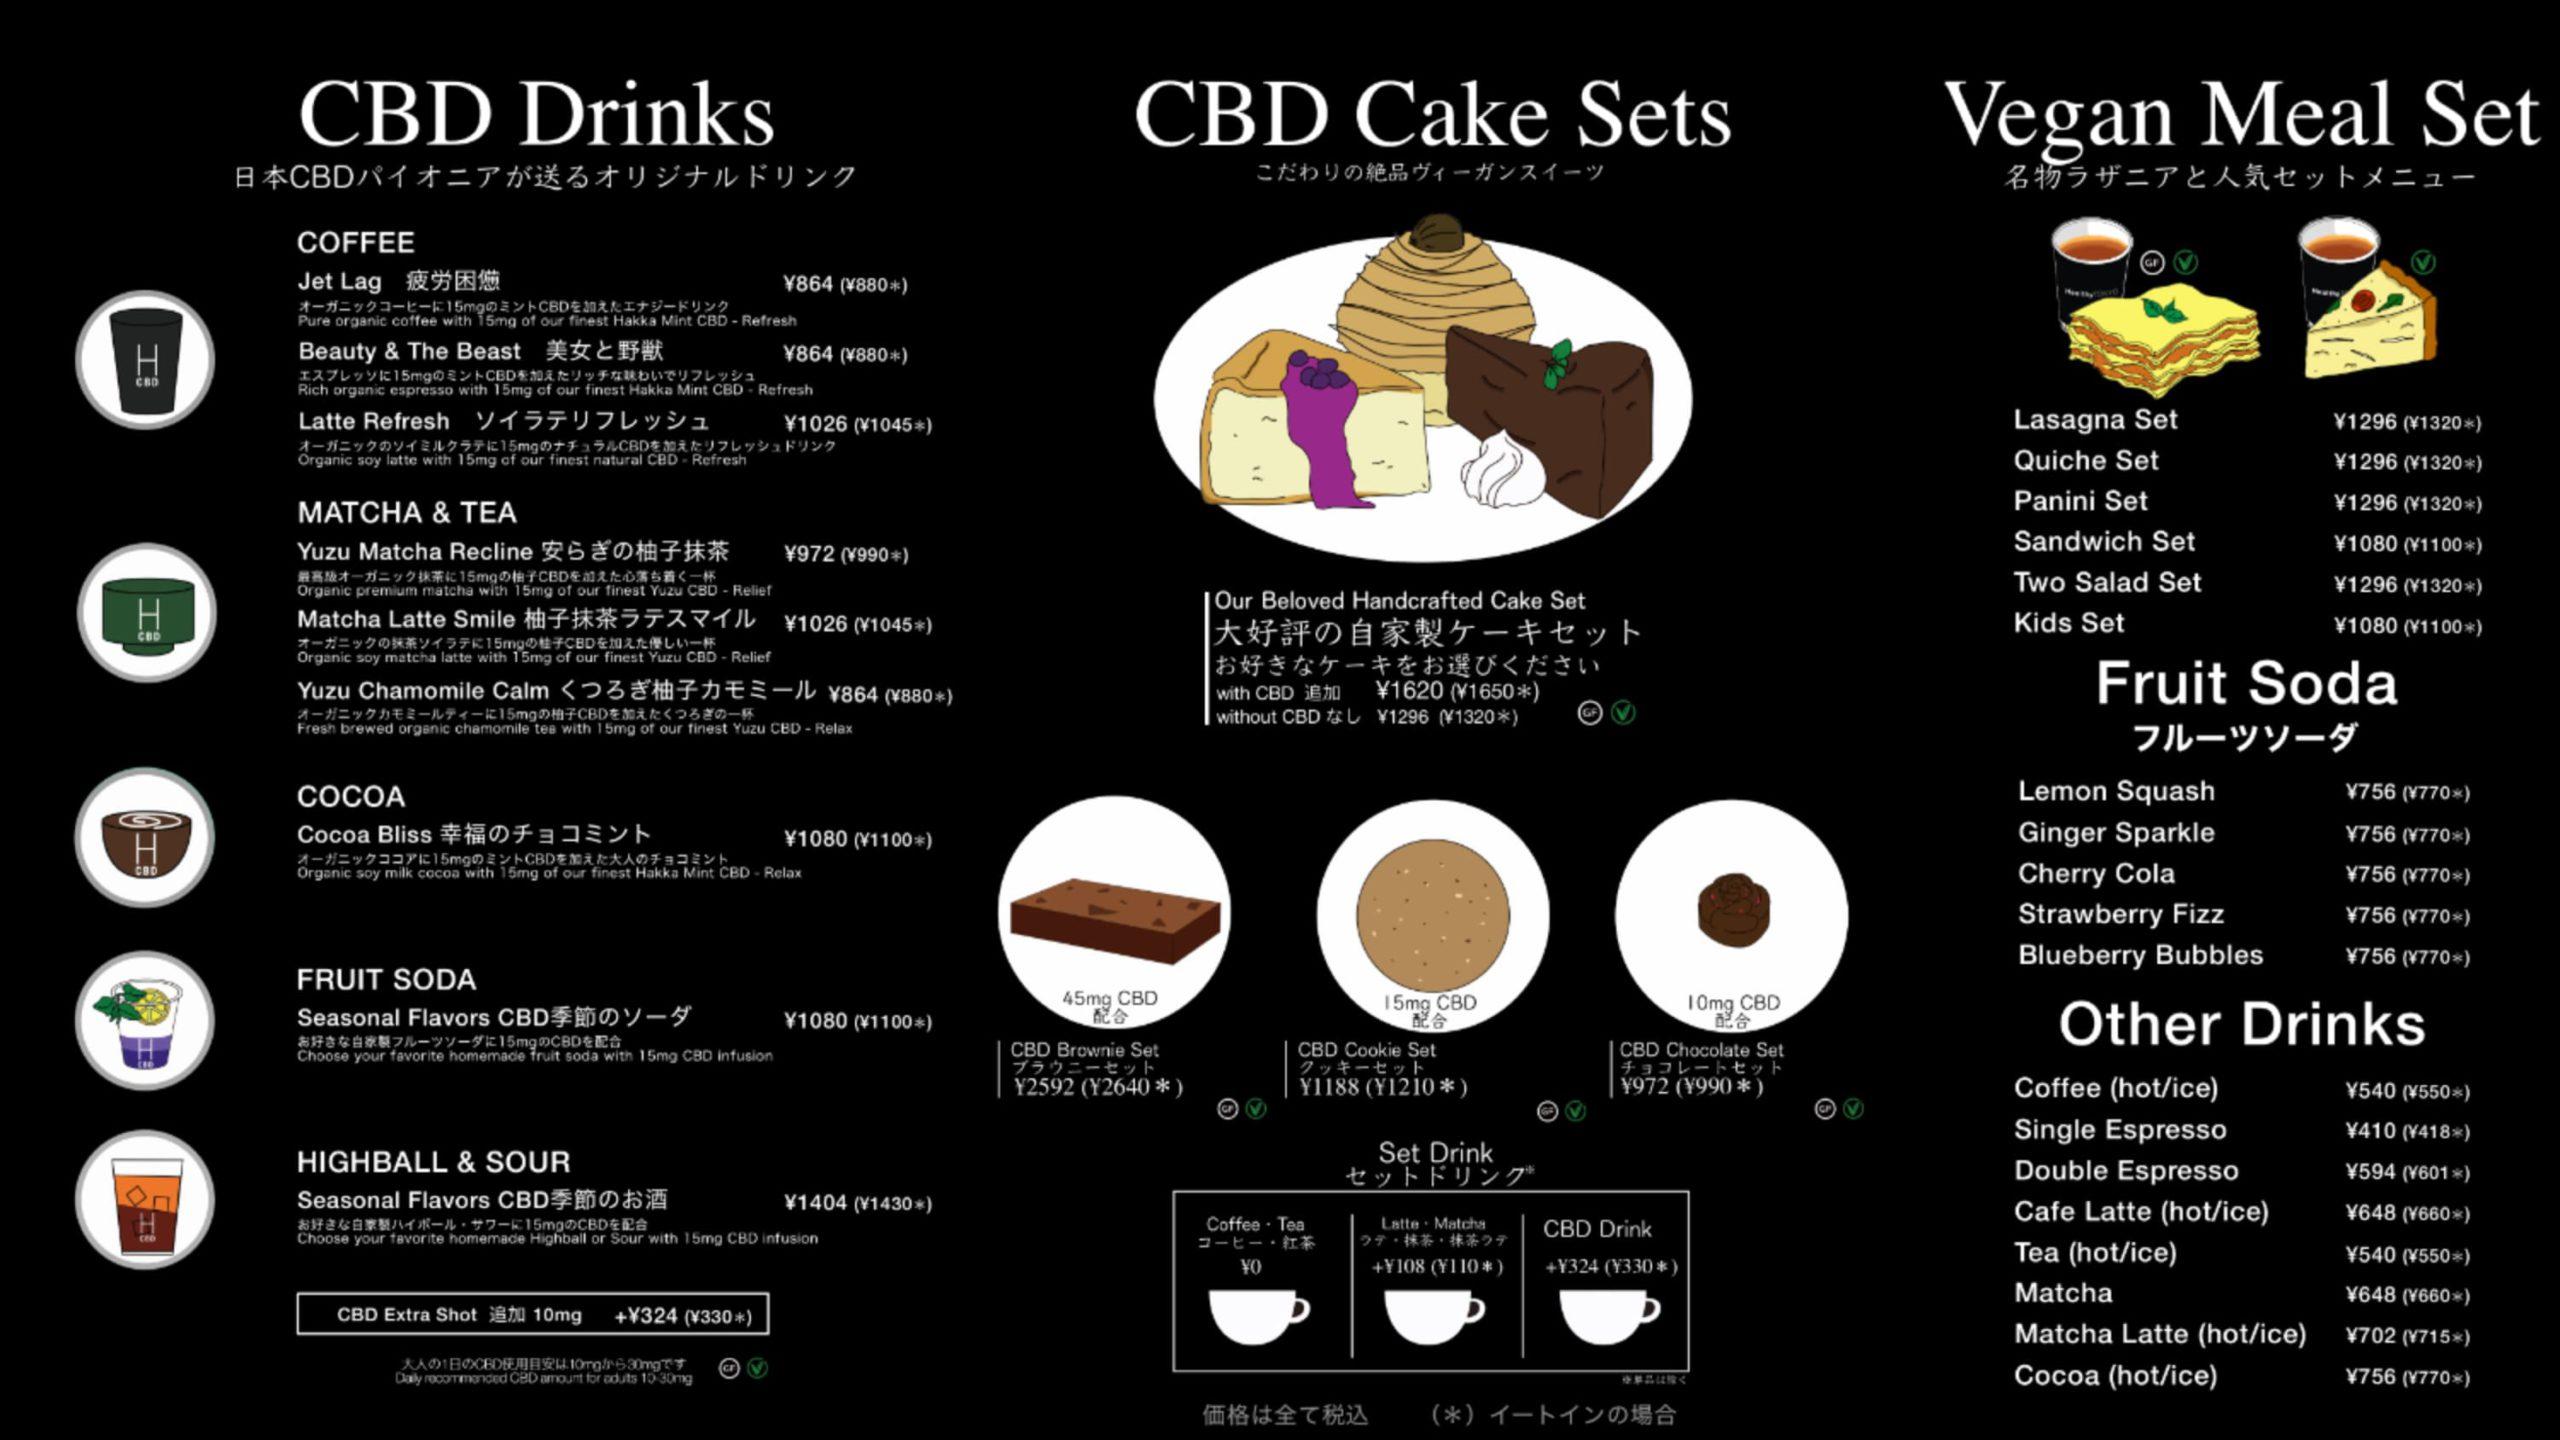 HealthyTOKYO CBD Factory and Cafe Edogawa menu 20210629